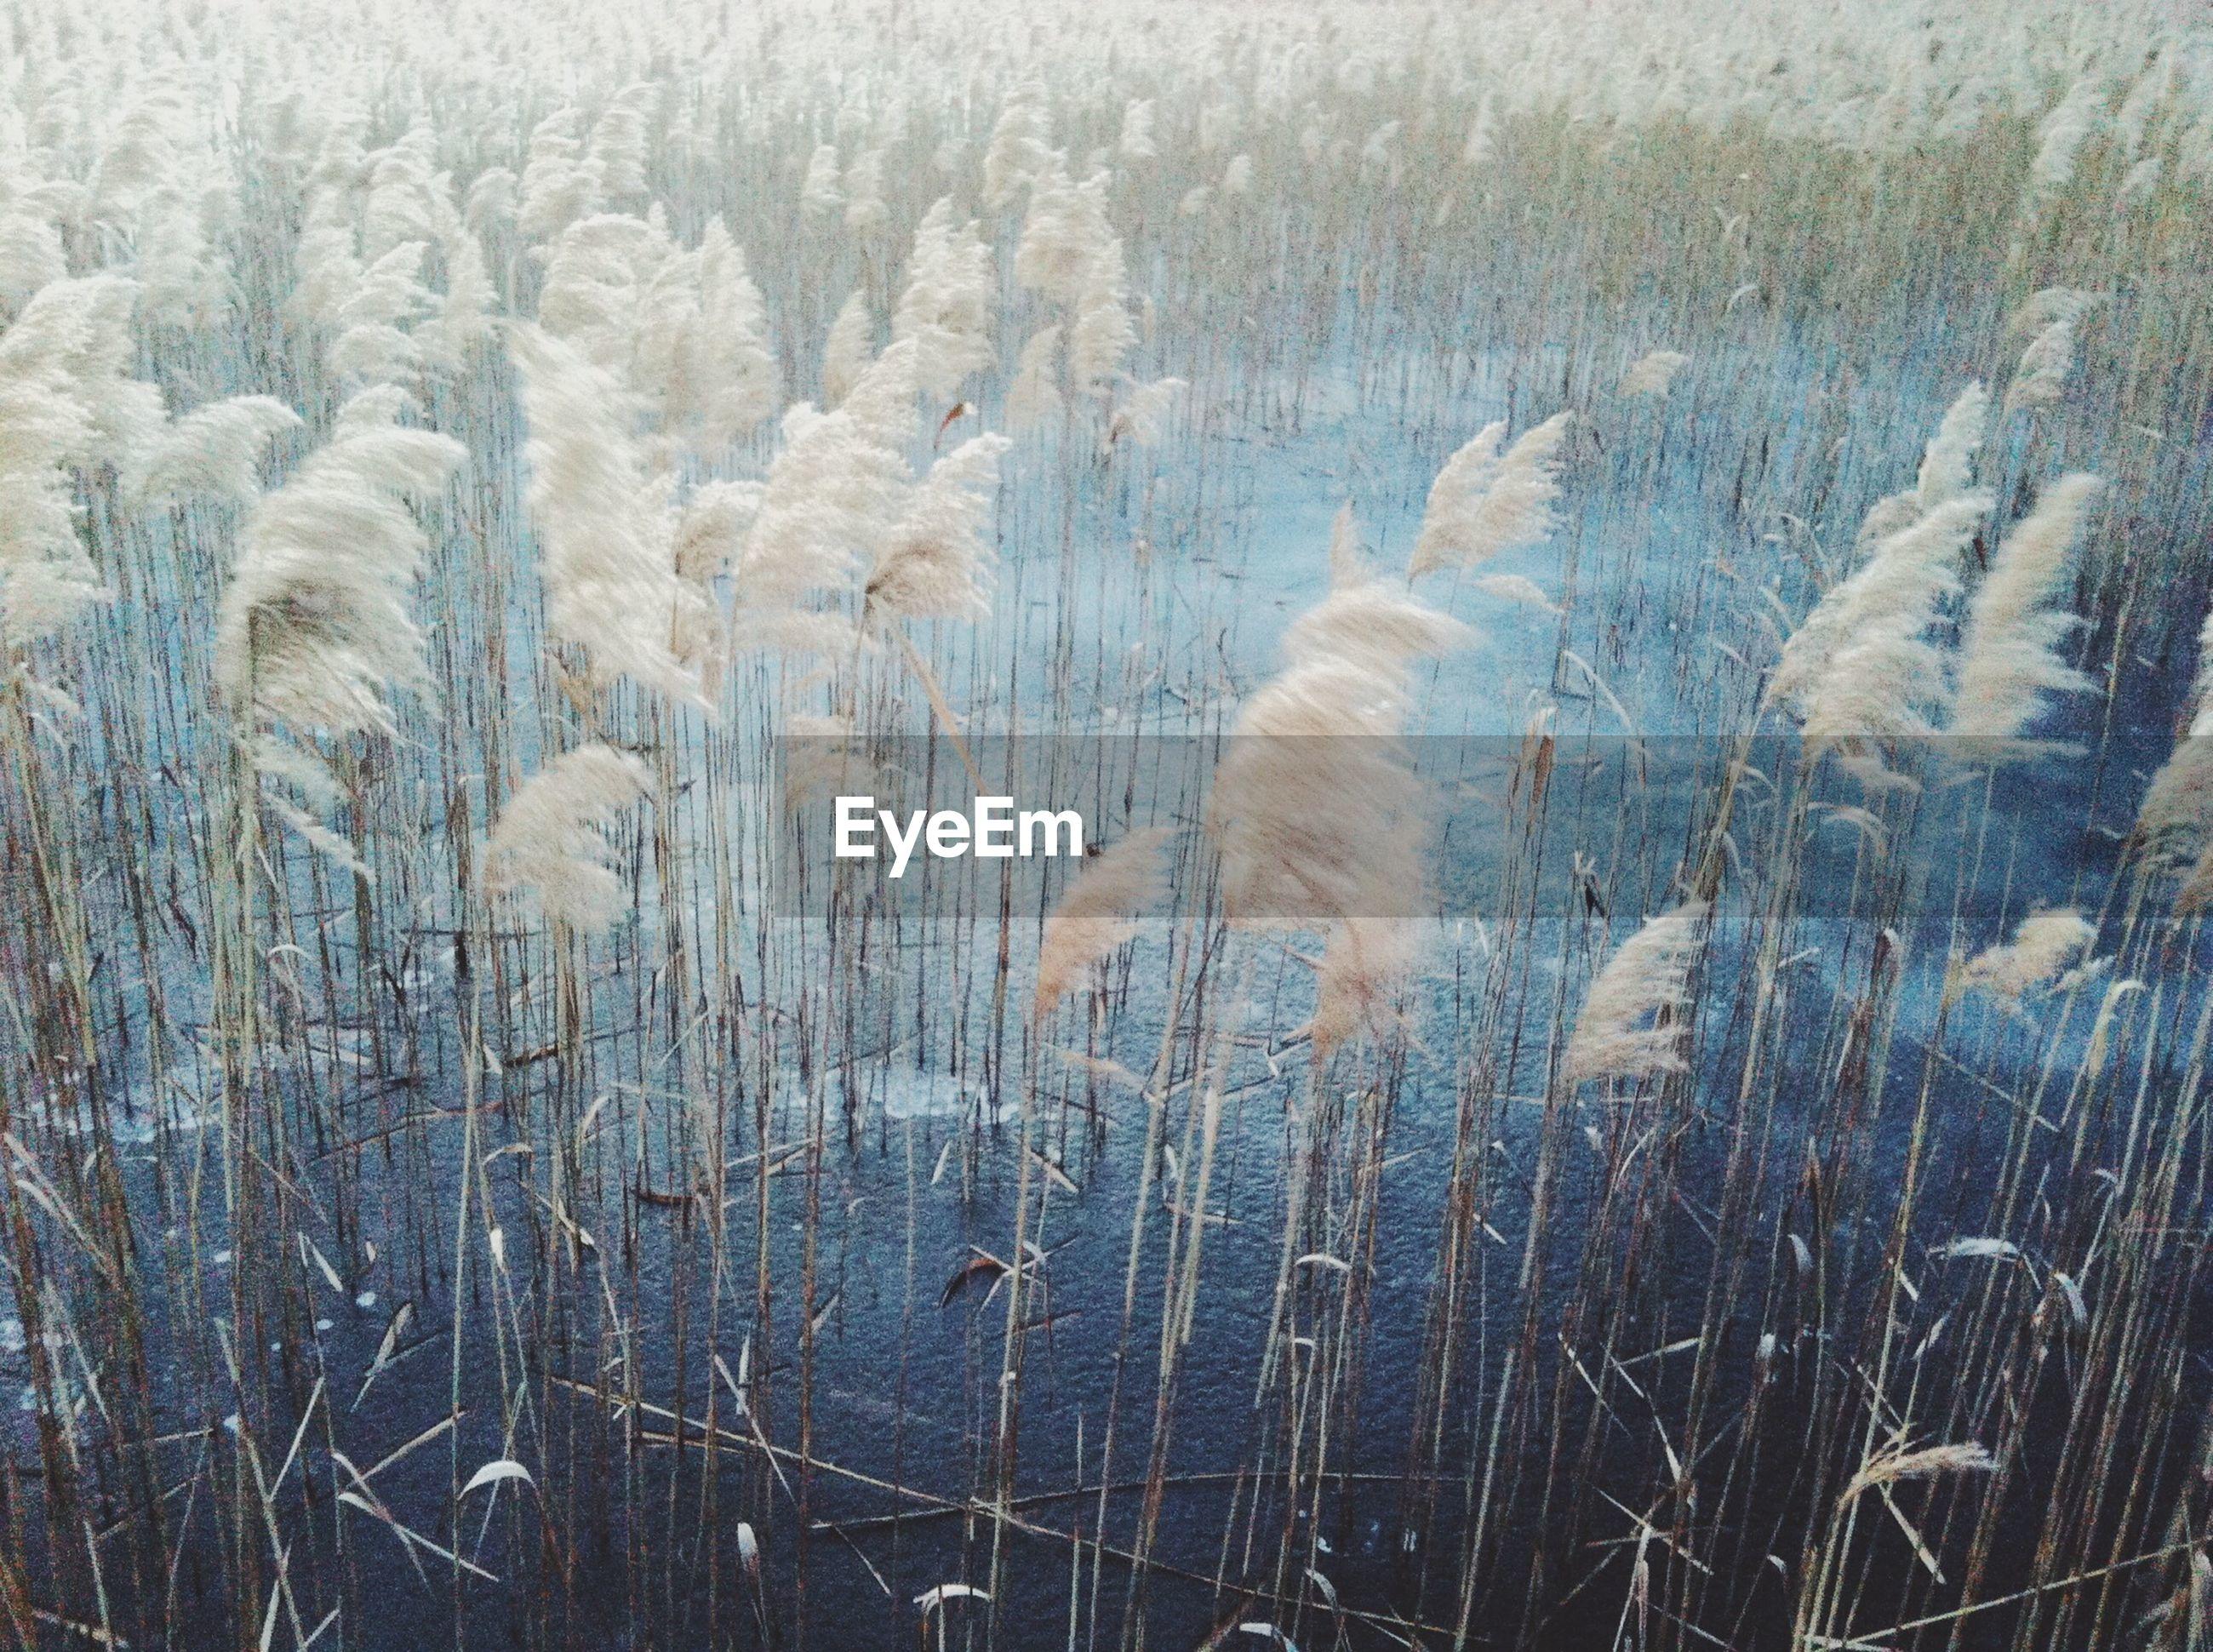 Reeds grass in pond